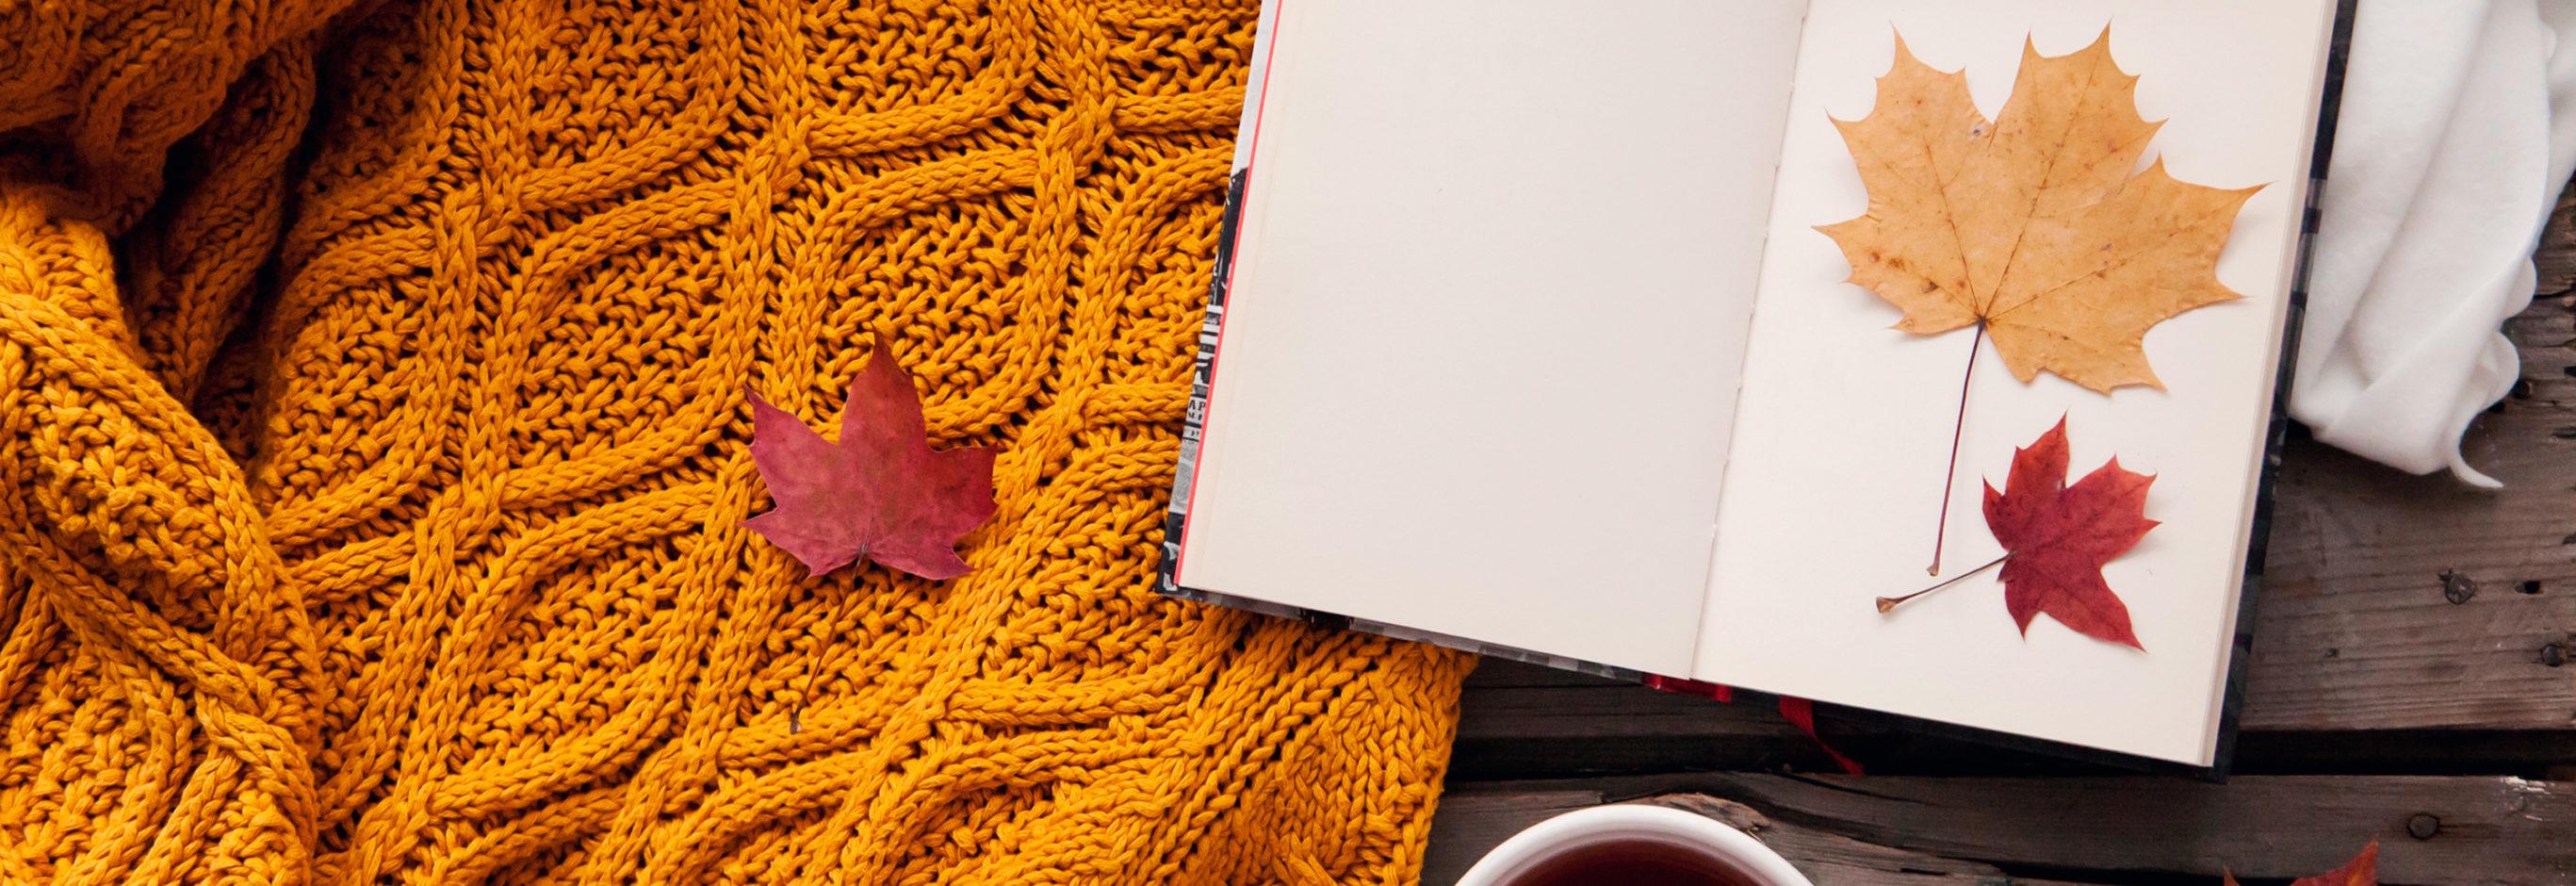 Осень теплый свитер картинки